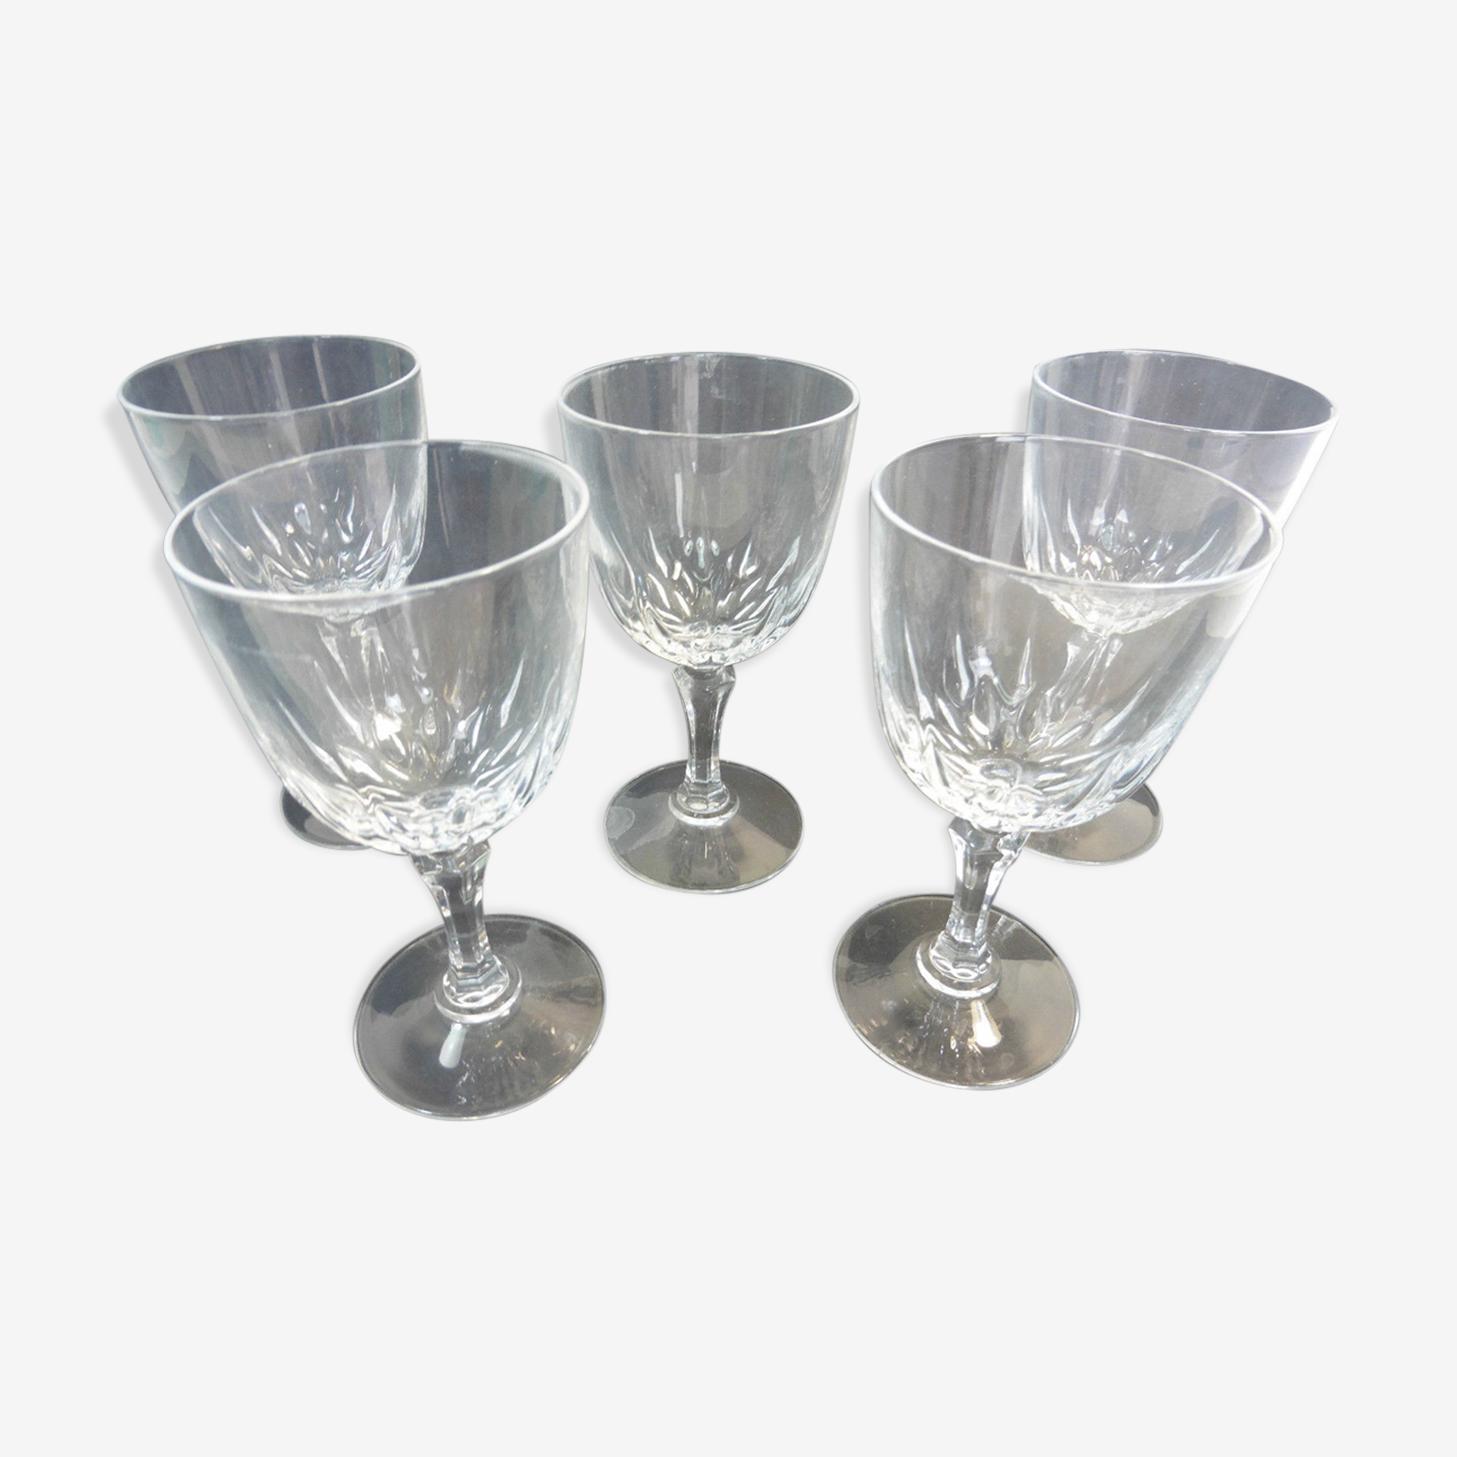 Ensemble de 5 verres pied en cristal  d'Arques